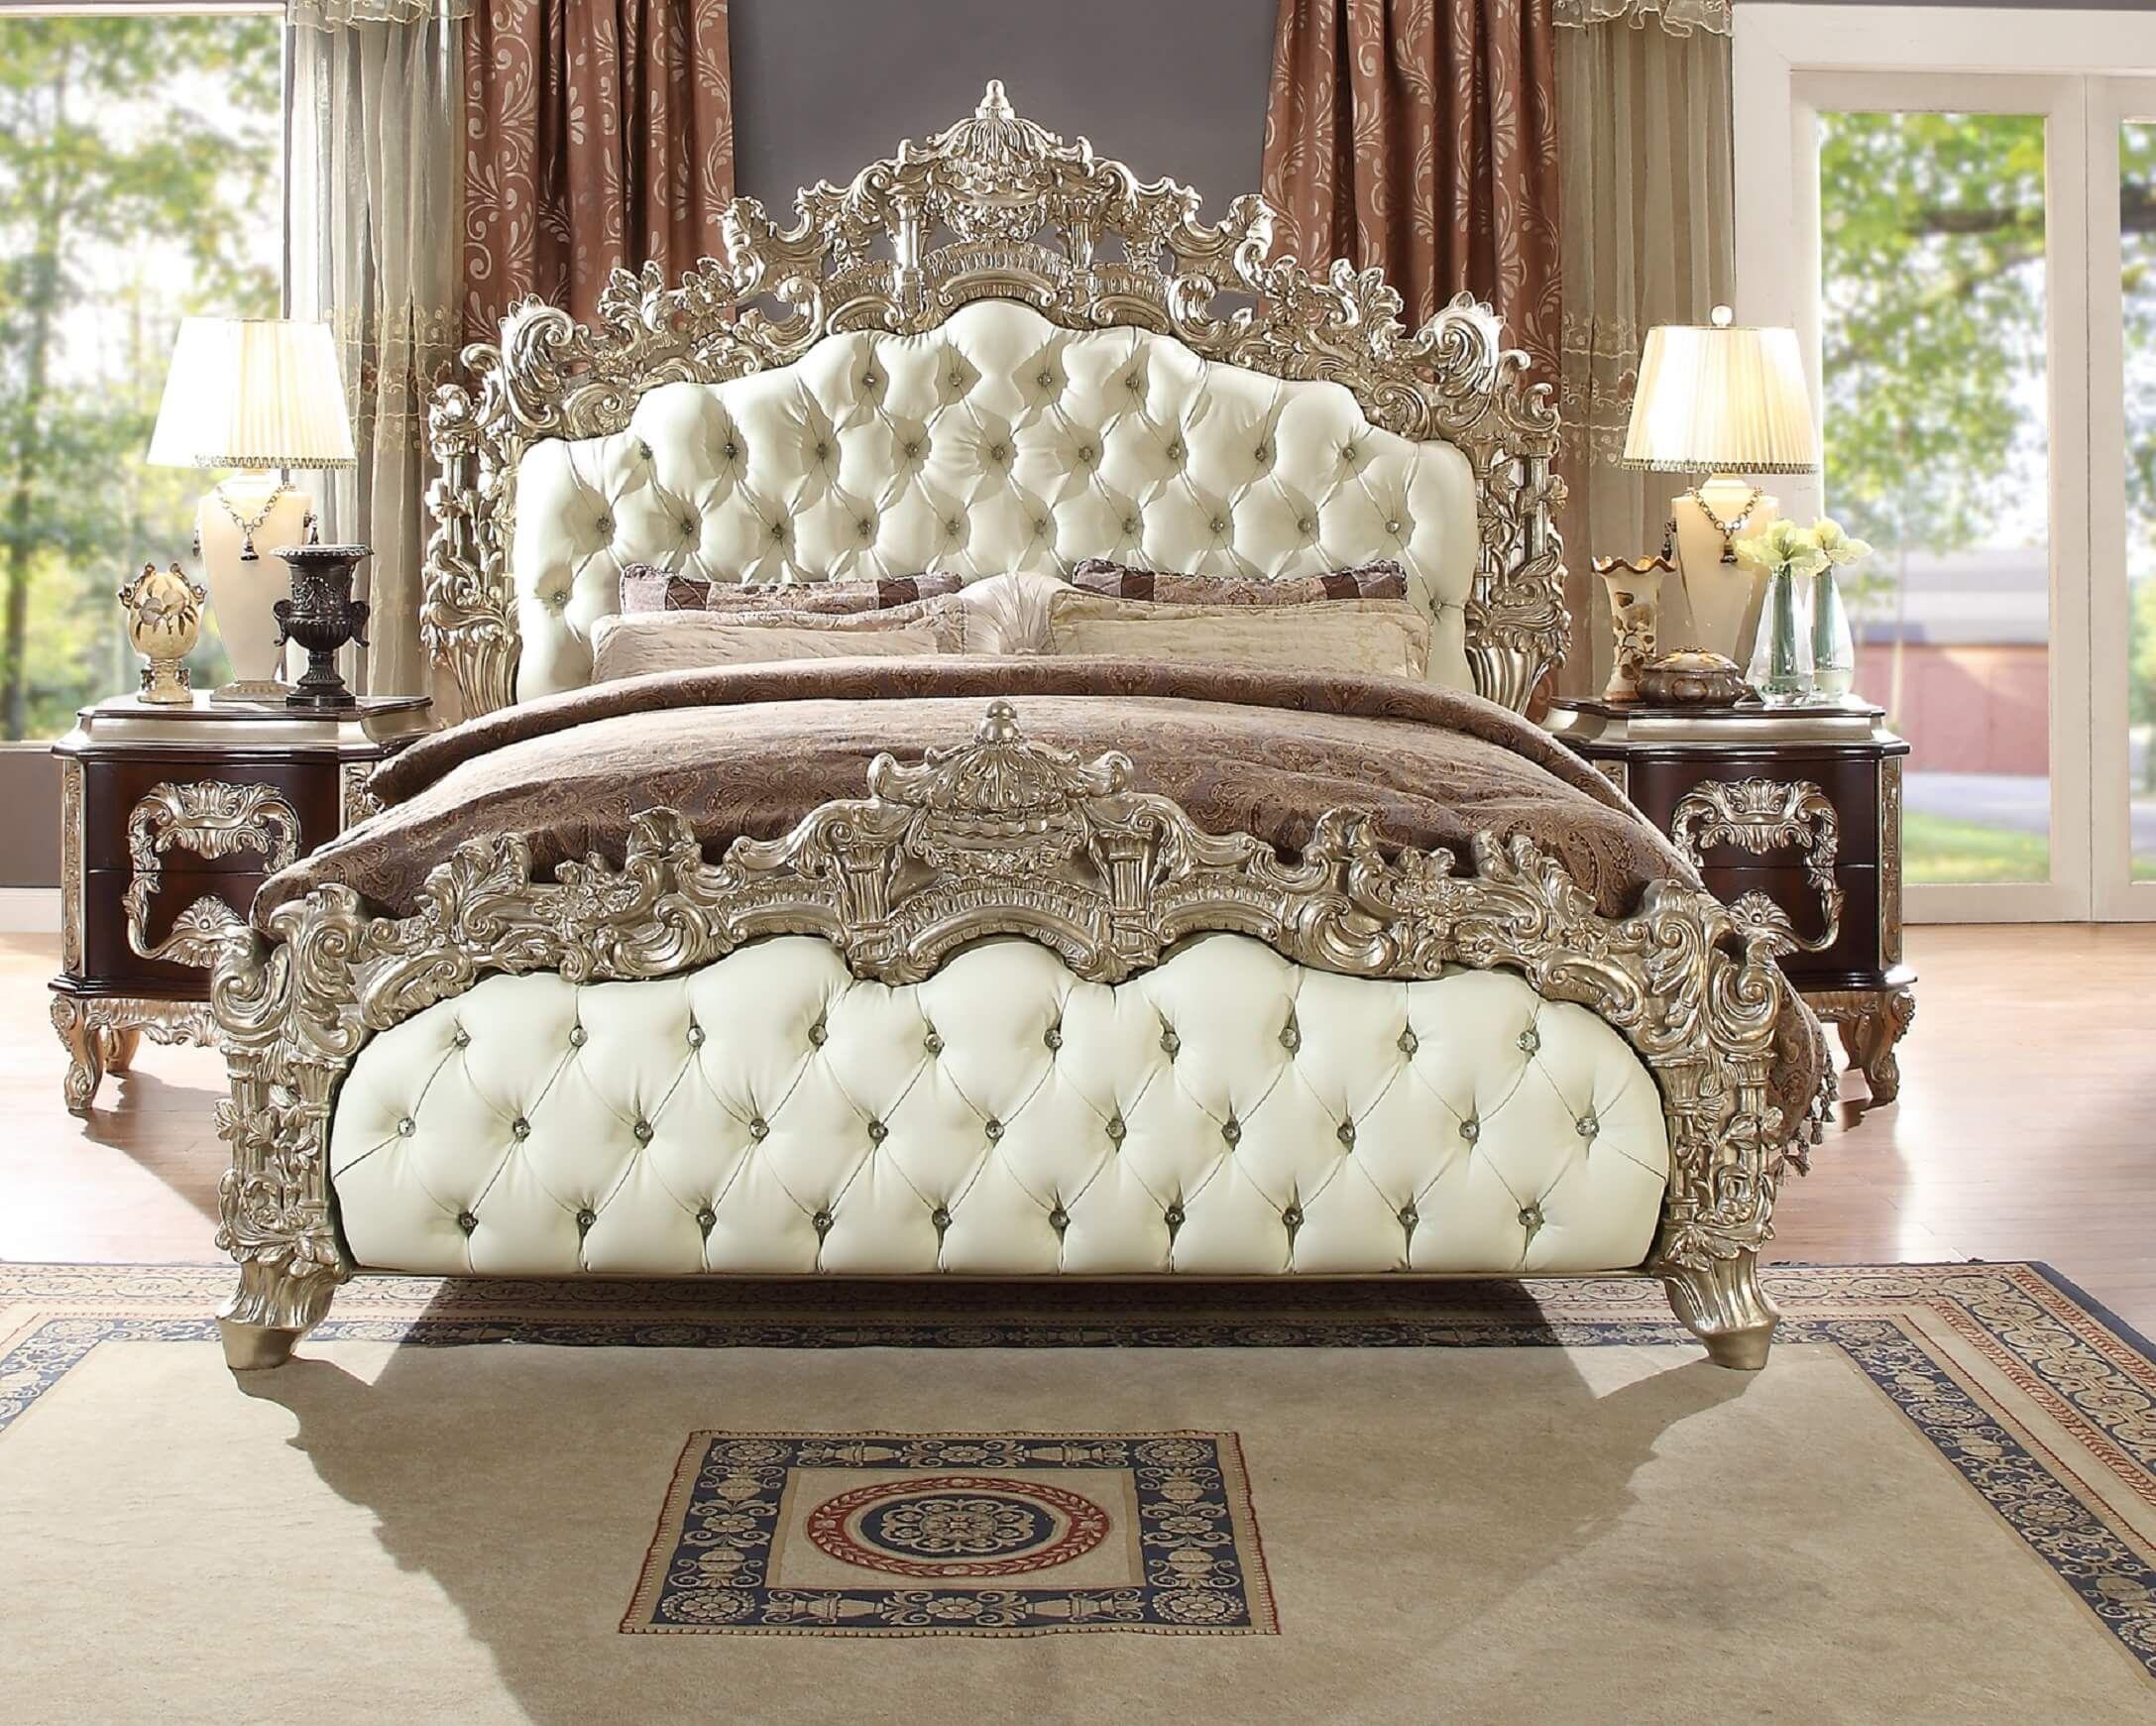 Homey Design Hd 8017 Cleopatra Bed Usa Furniture Warehouse